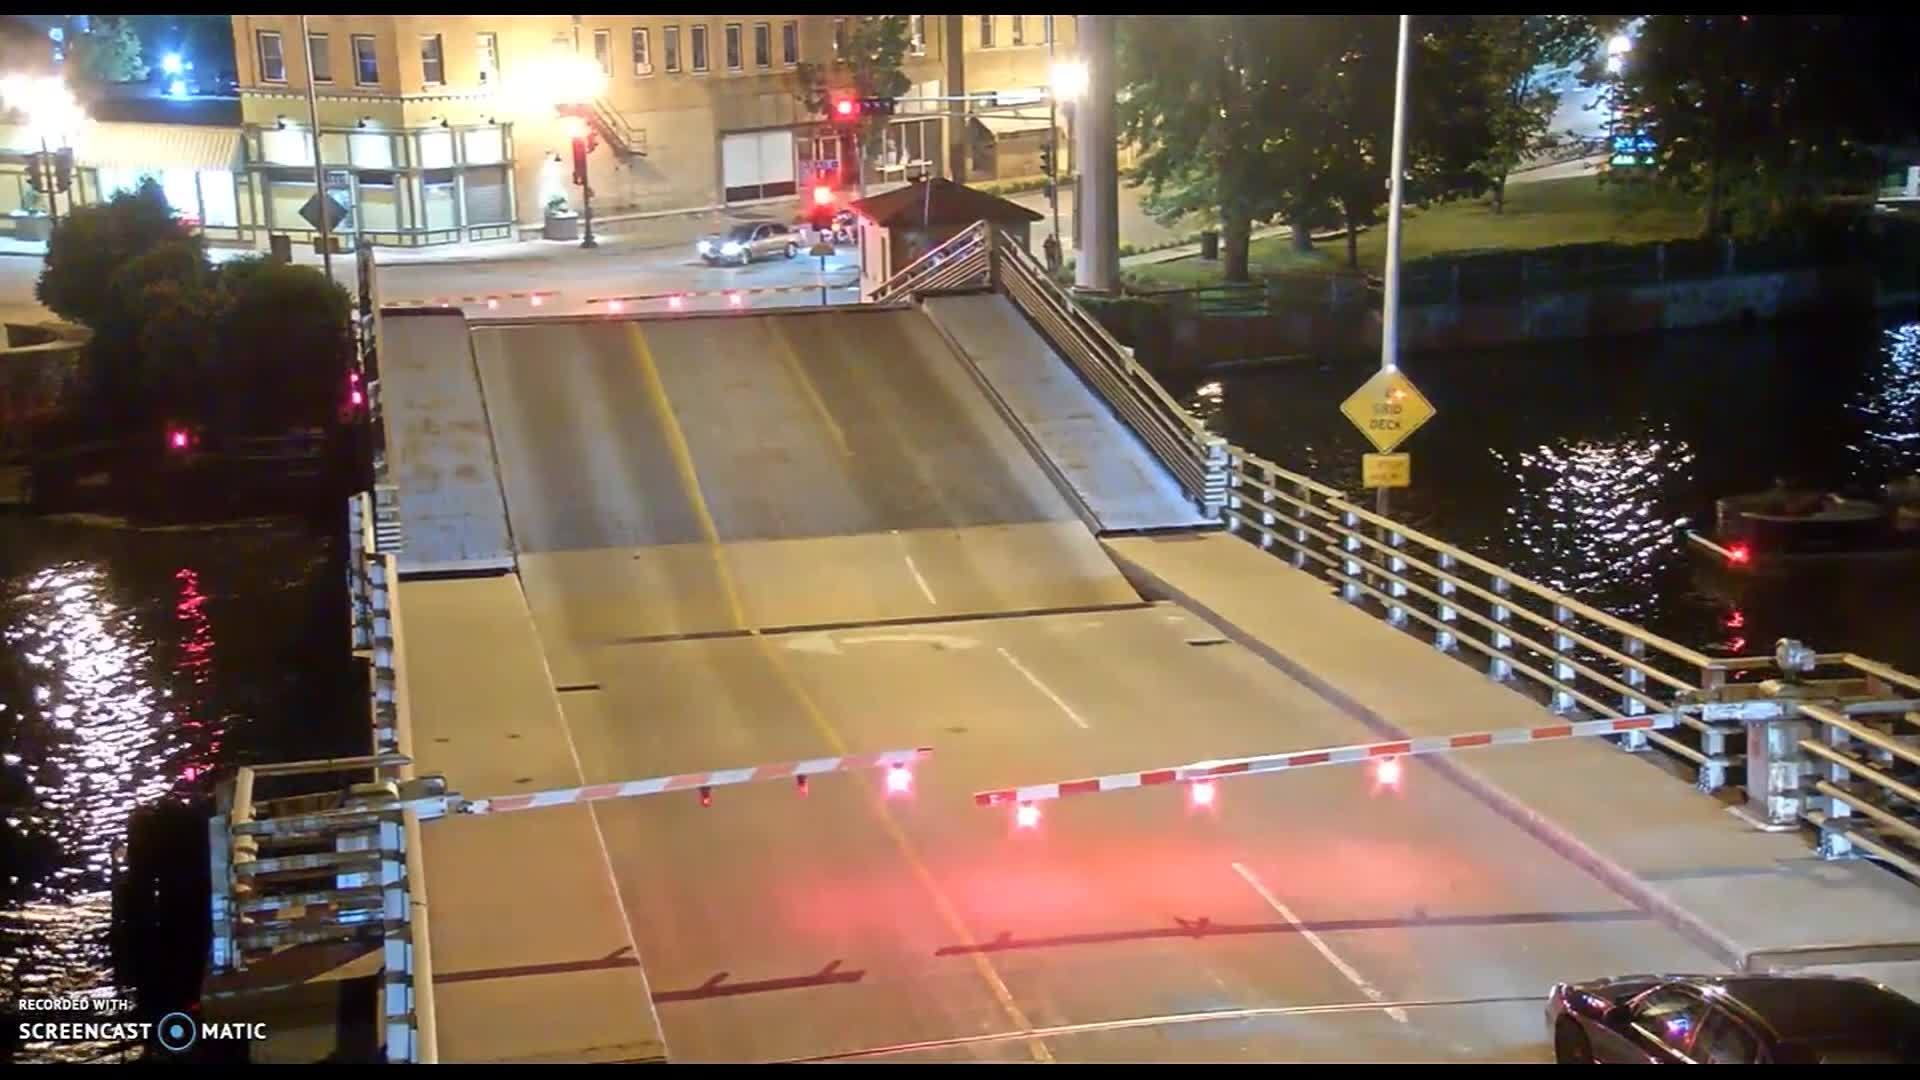 Bicyclist falls into drawbridge